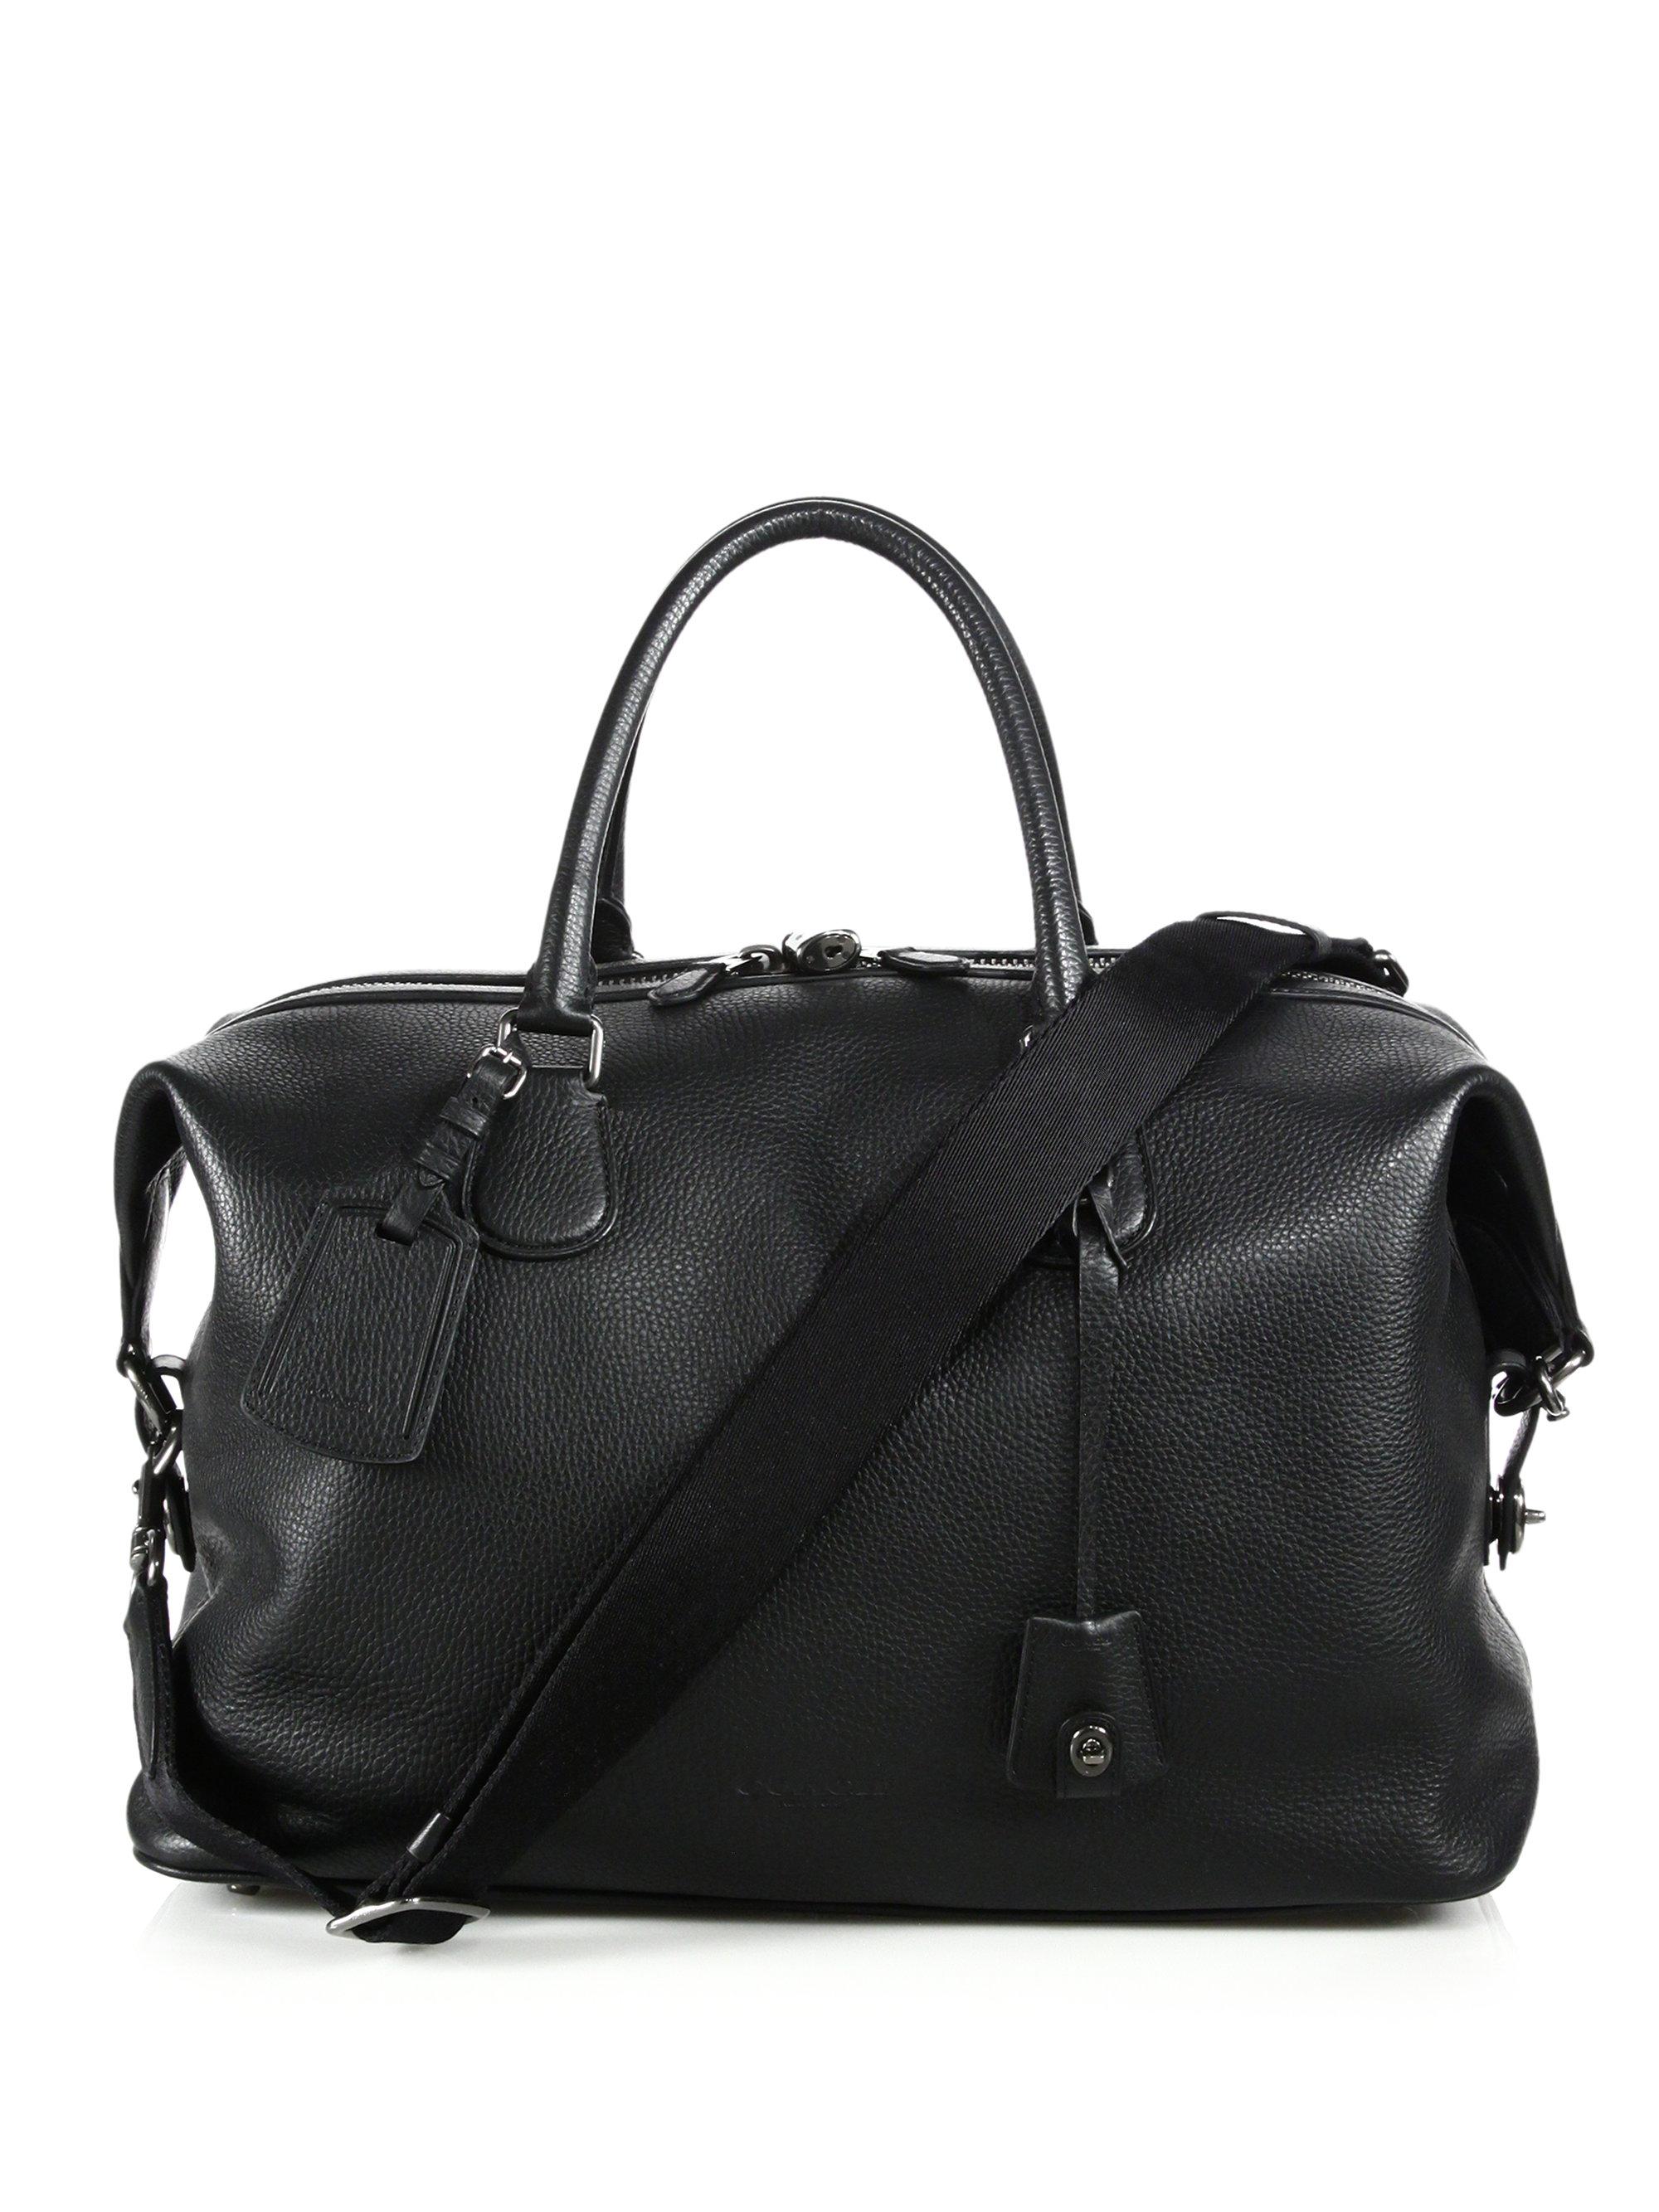 Coach Explorer Leather Duffel Bag In Black For Men Lyst